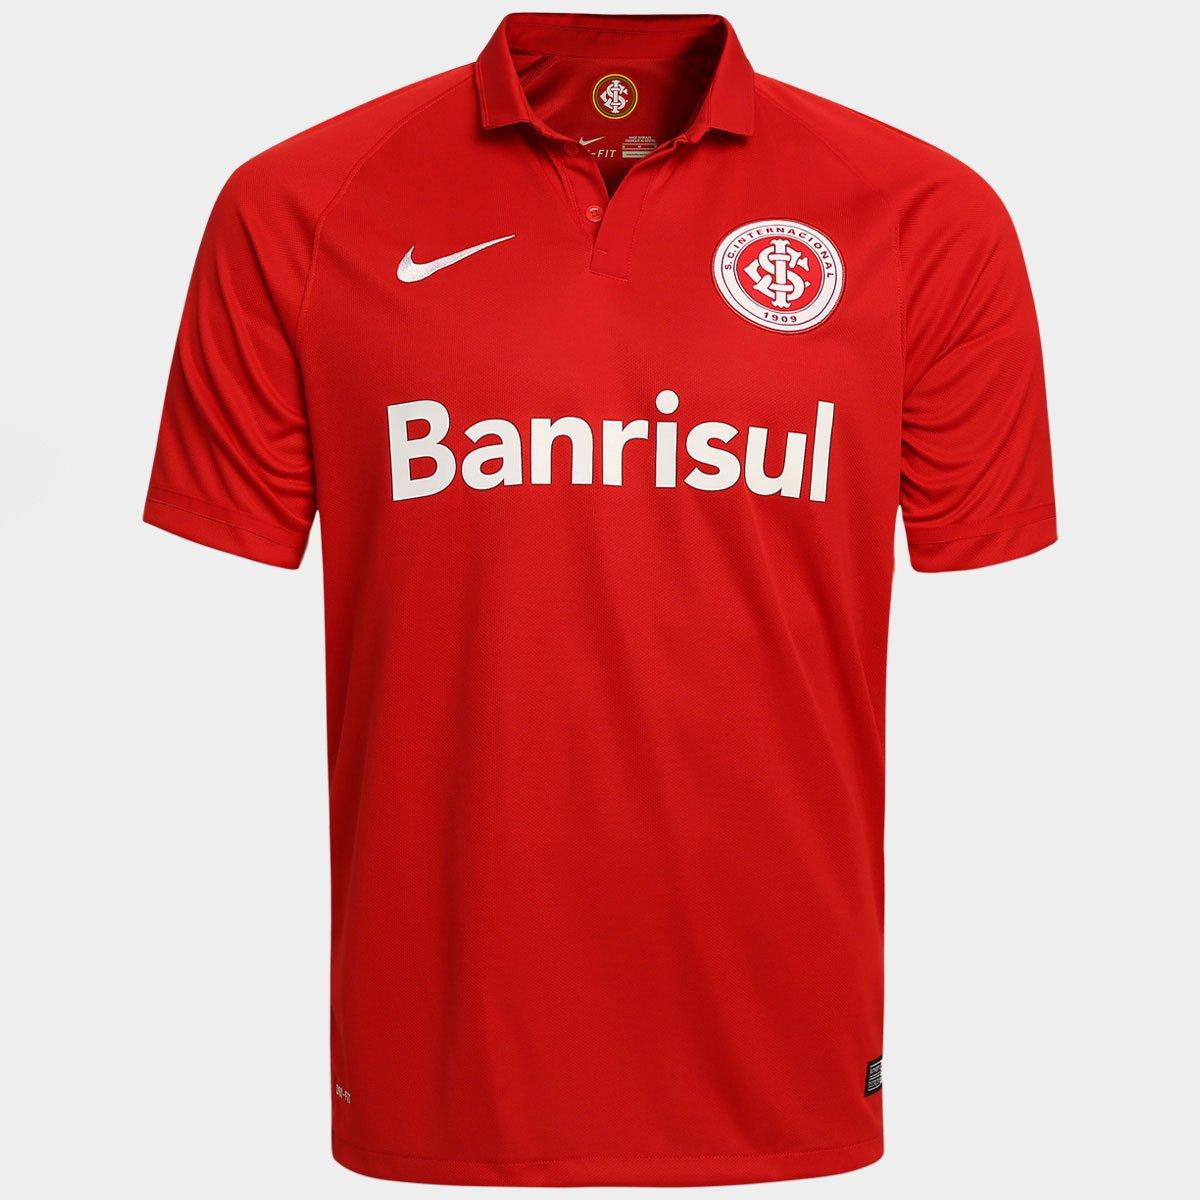 Camisa Internacional I 15 16 s nº Torcedor Nike Masculina - Compre Agora  ddba36e0b5f4e